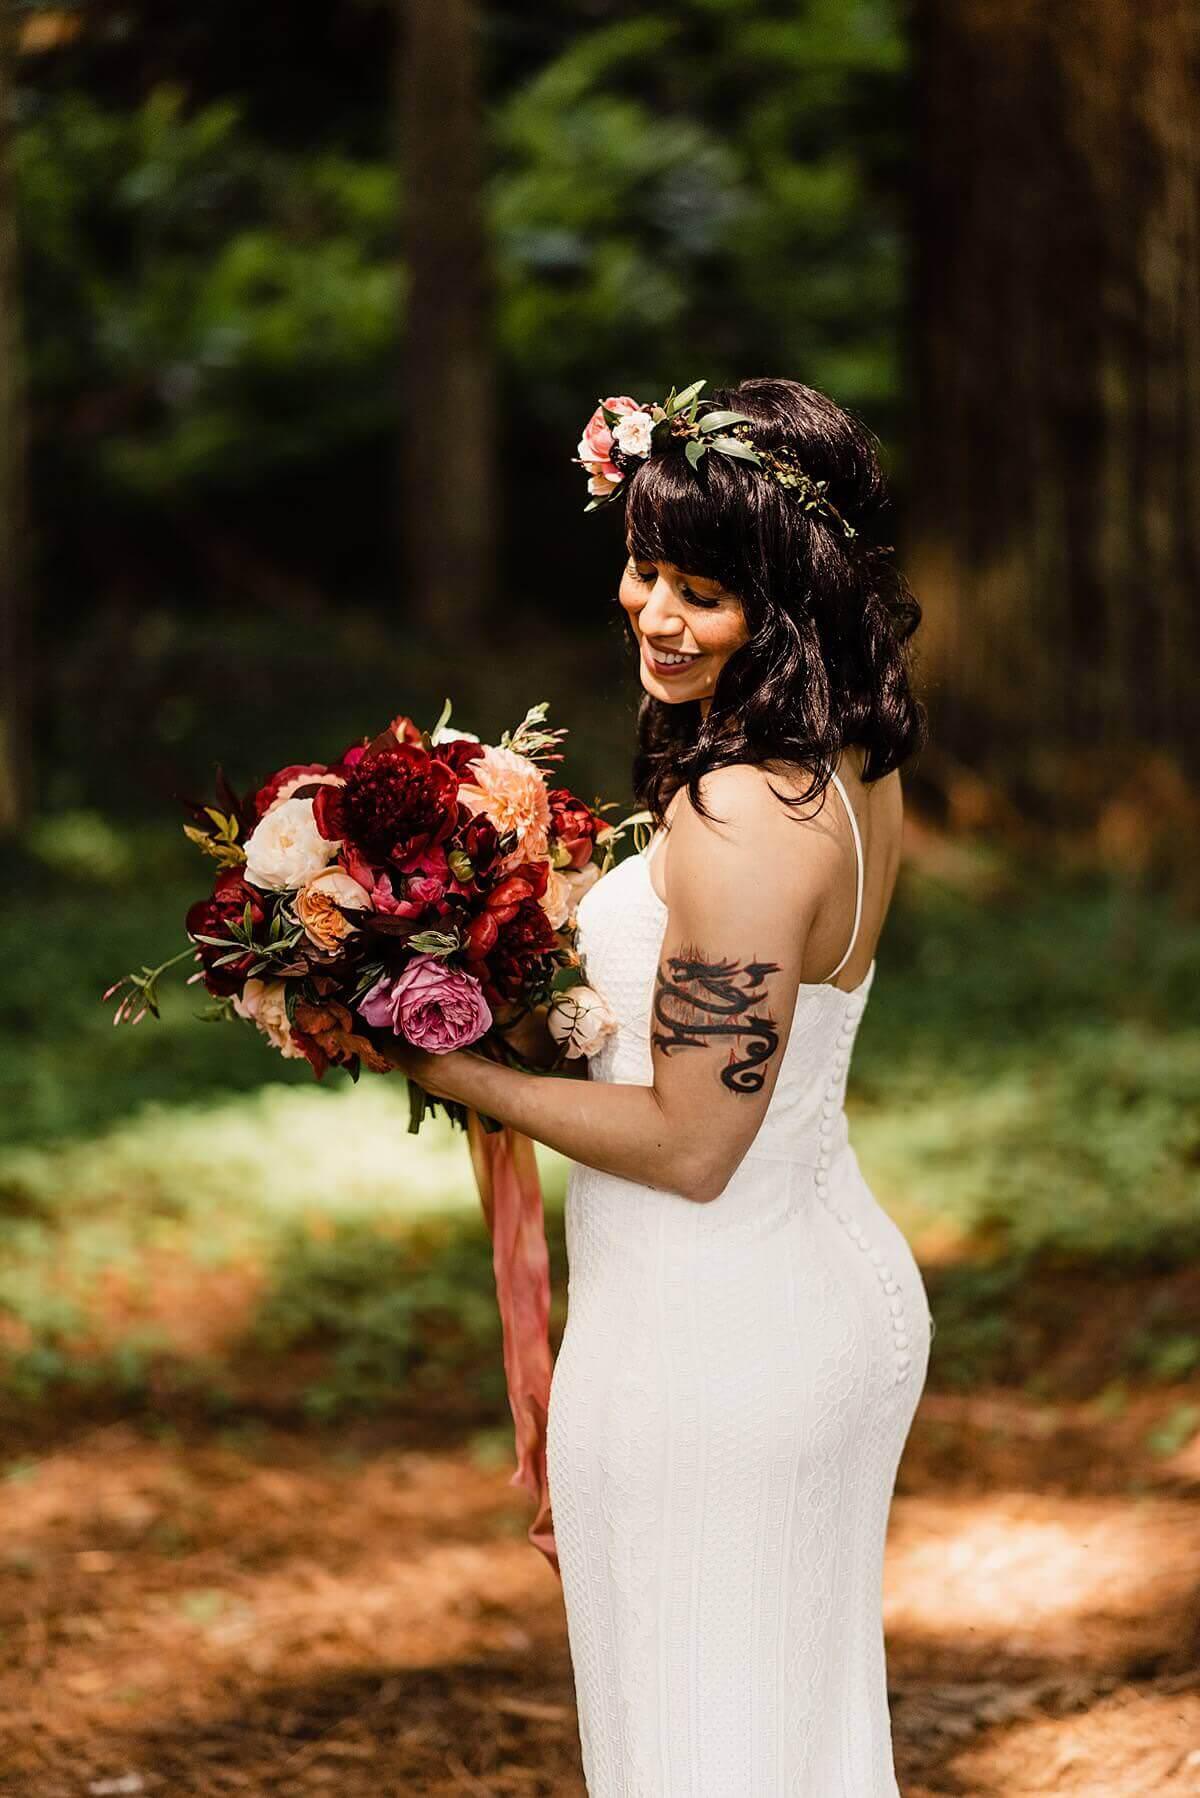 Allison-Brooks-Jedediah-Smiith-Redwoods-Adventure-Elopement-Wedding-S-Photography-Blog_0008.jpg